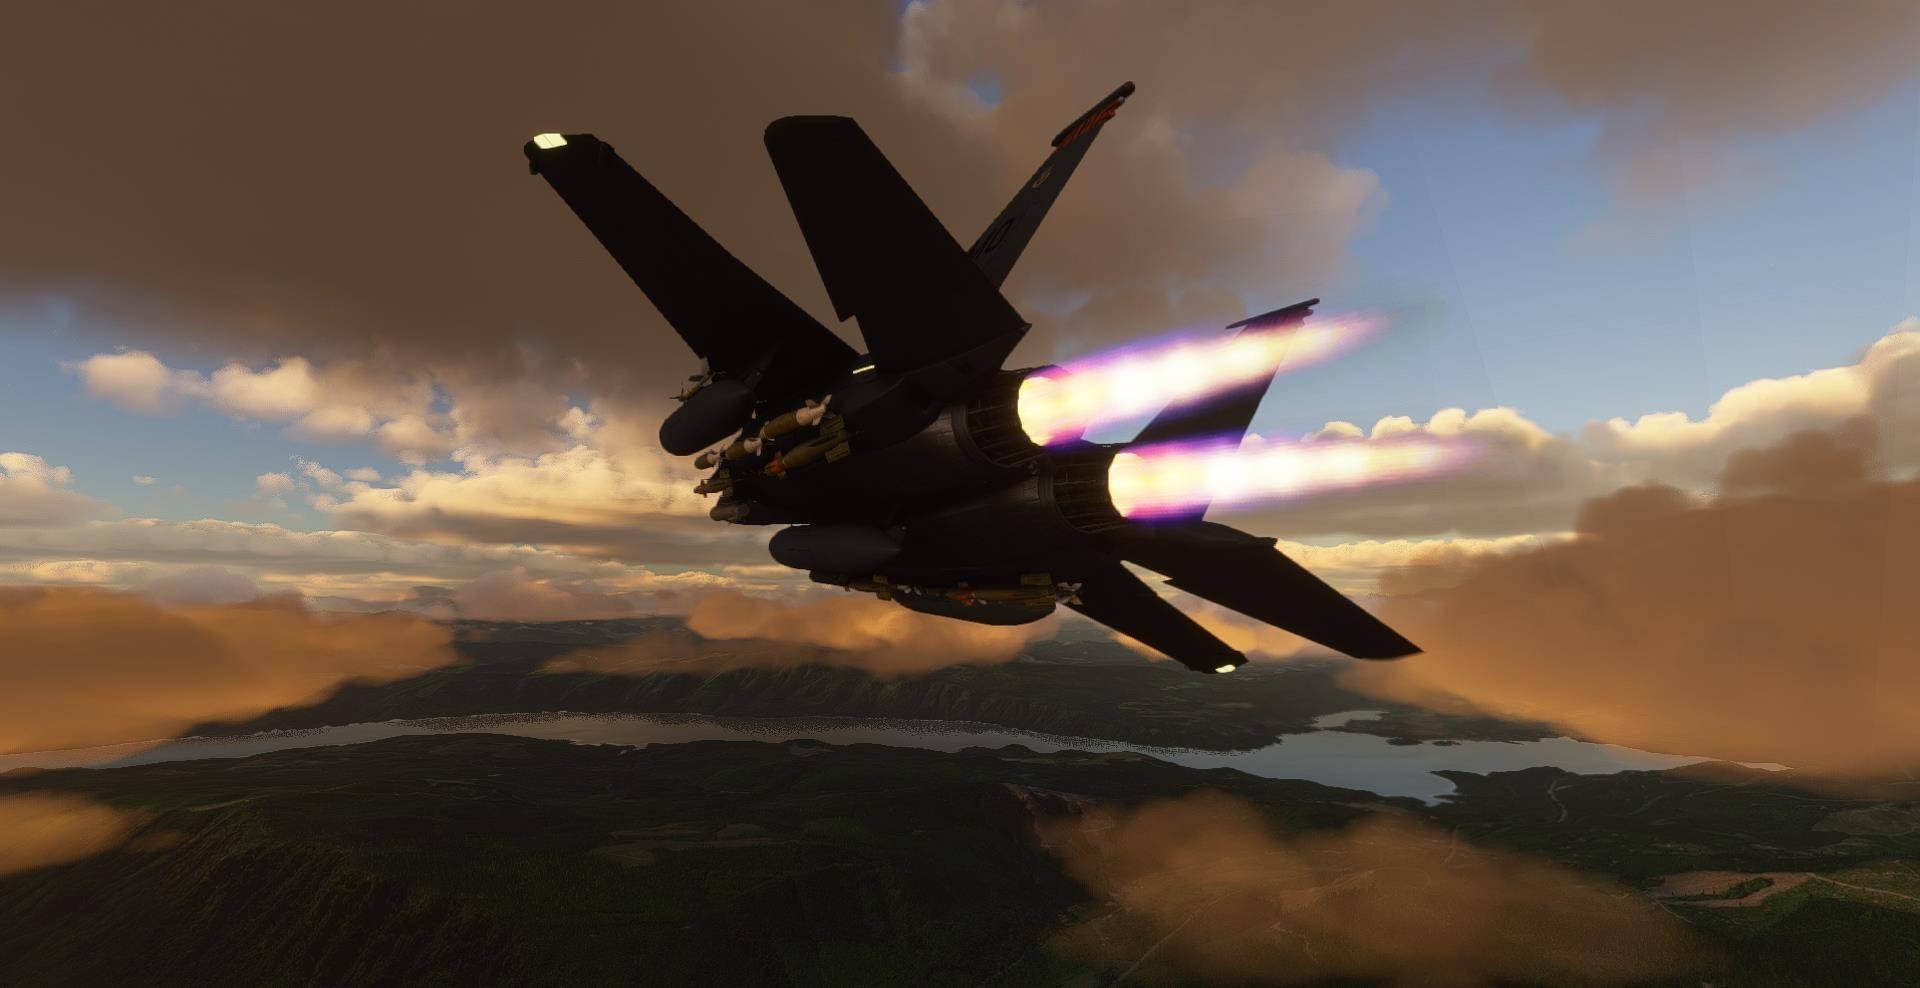 dc-designs-f15-c-d-e-i-eagle-microsoft-flight-simulator_25_ss_l_210120173358